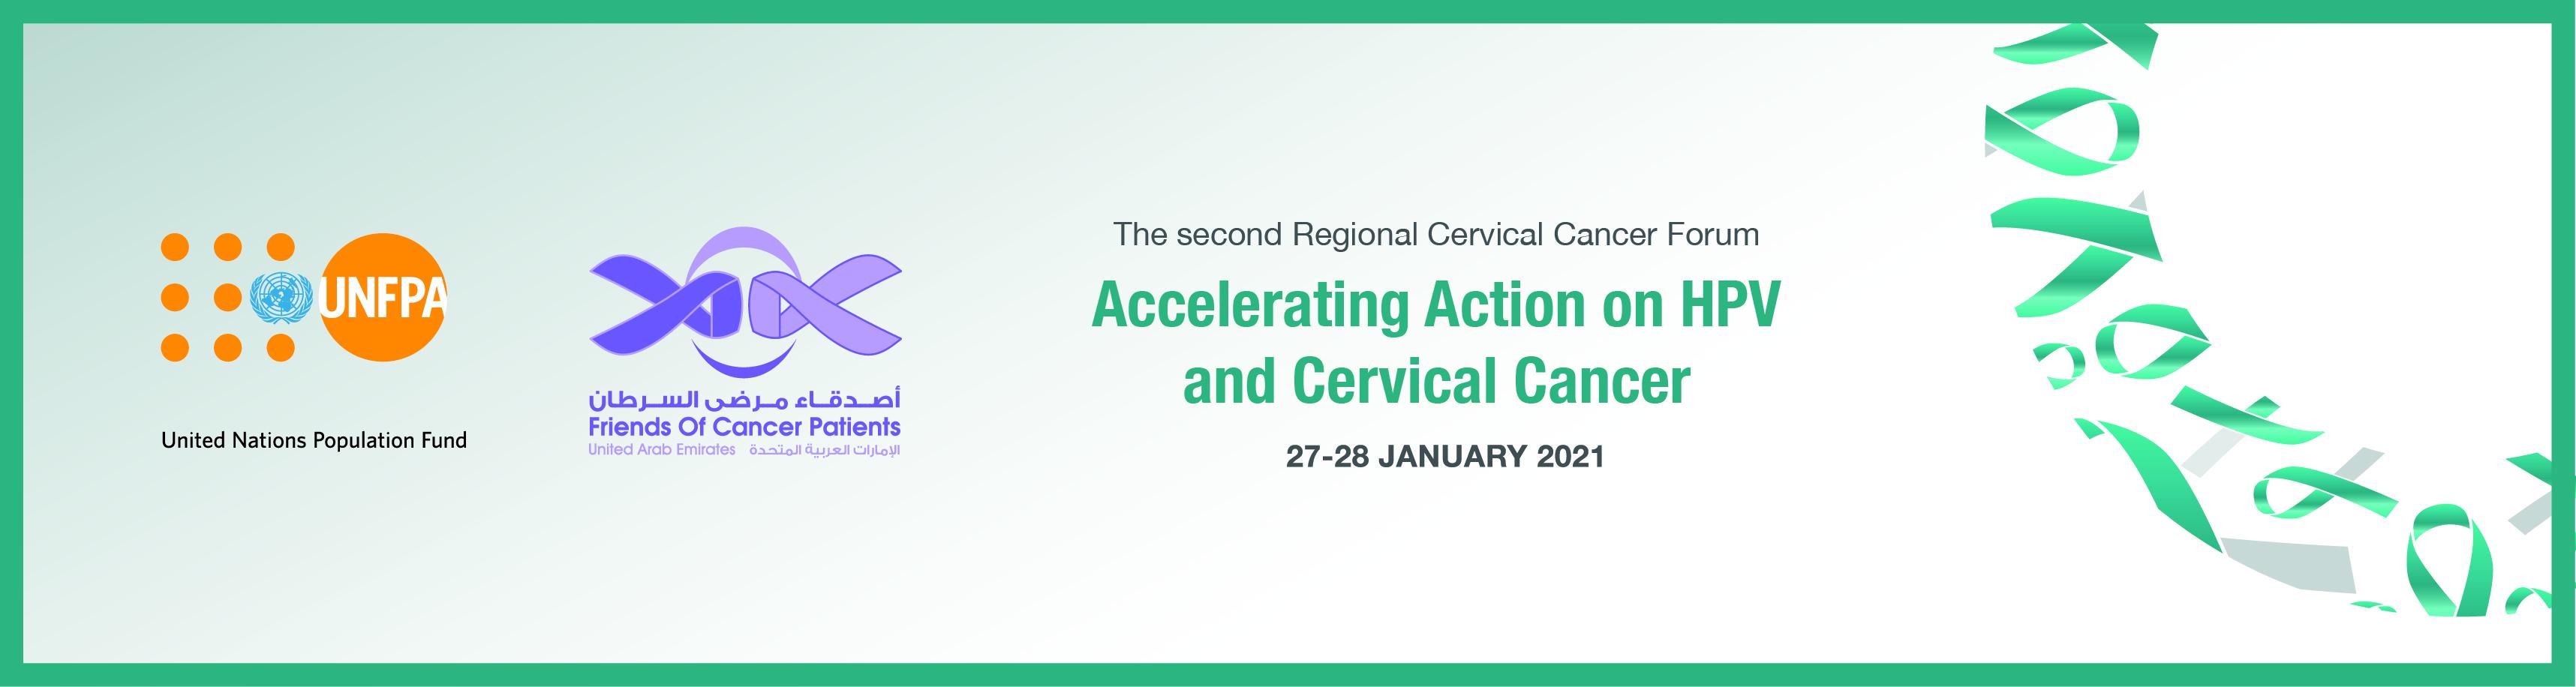 The Second Regional Cervical Cancer Forum